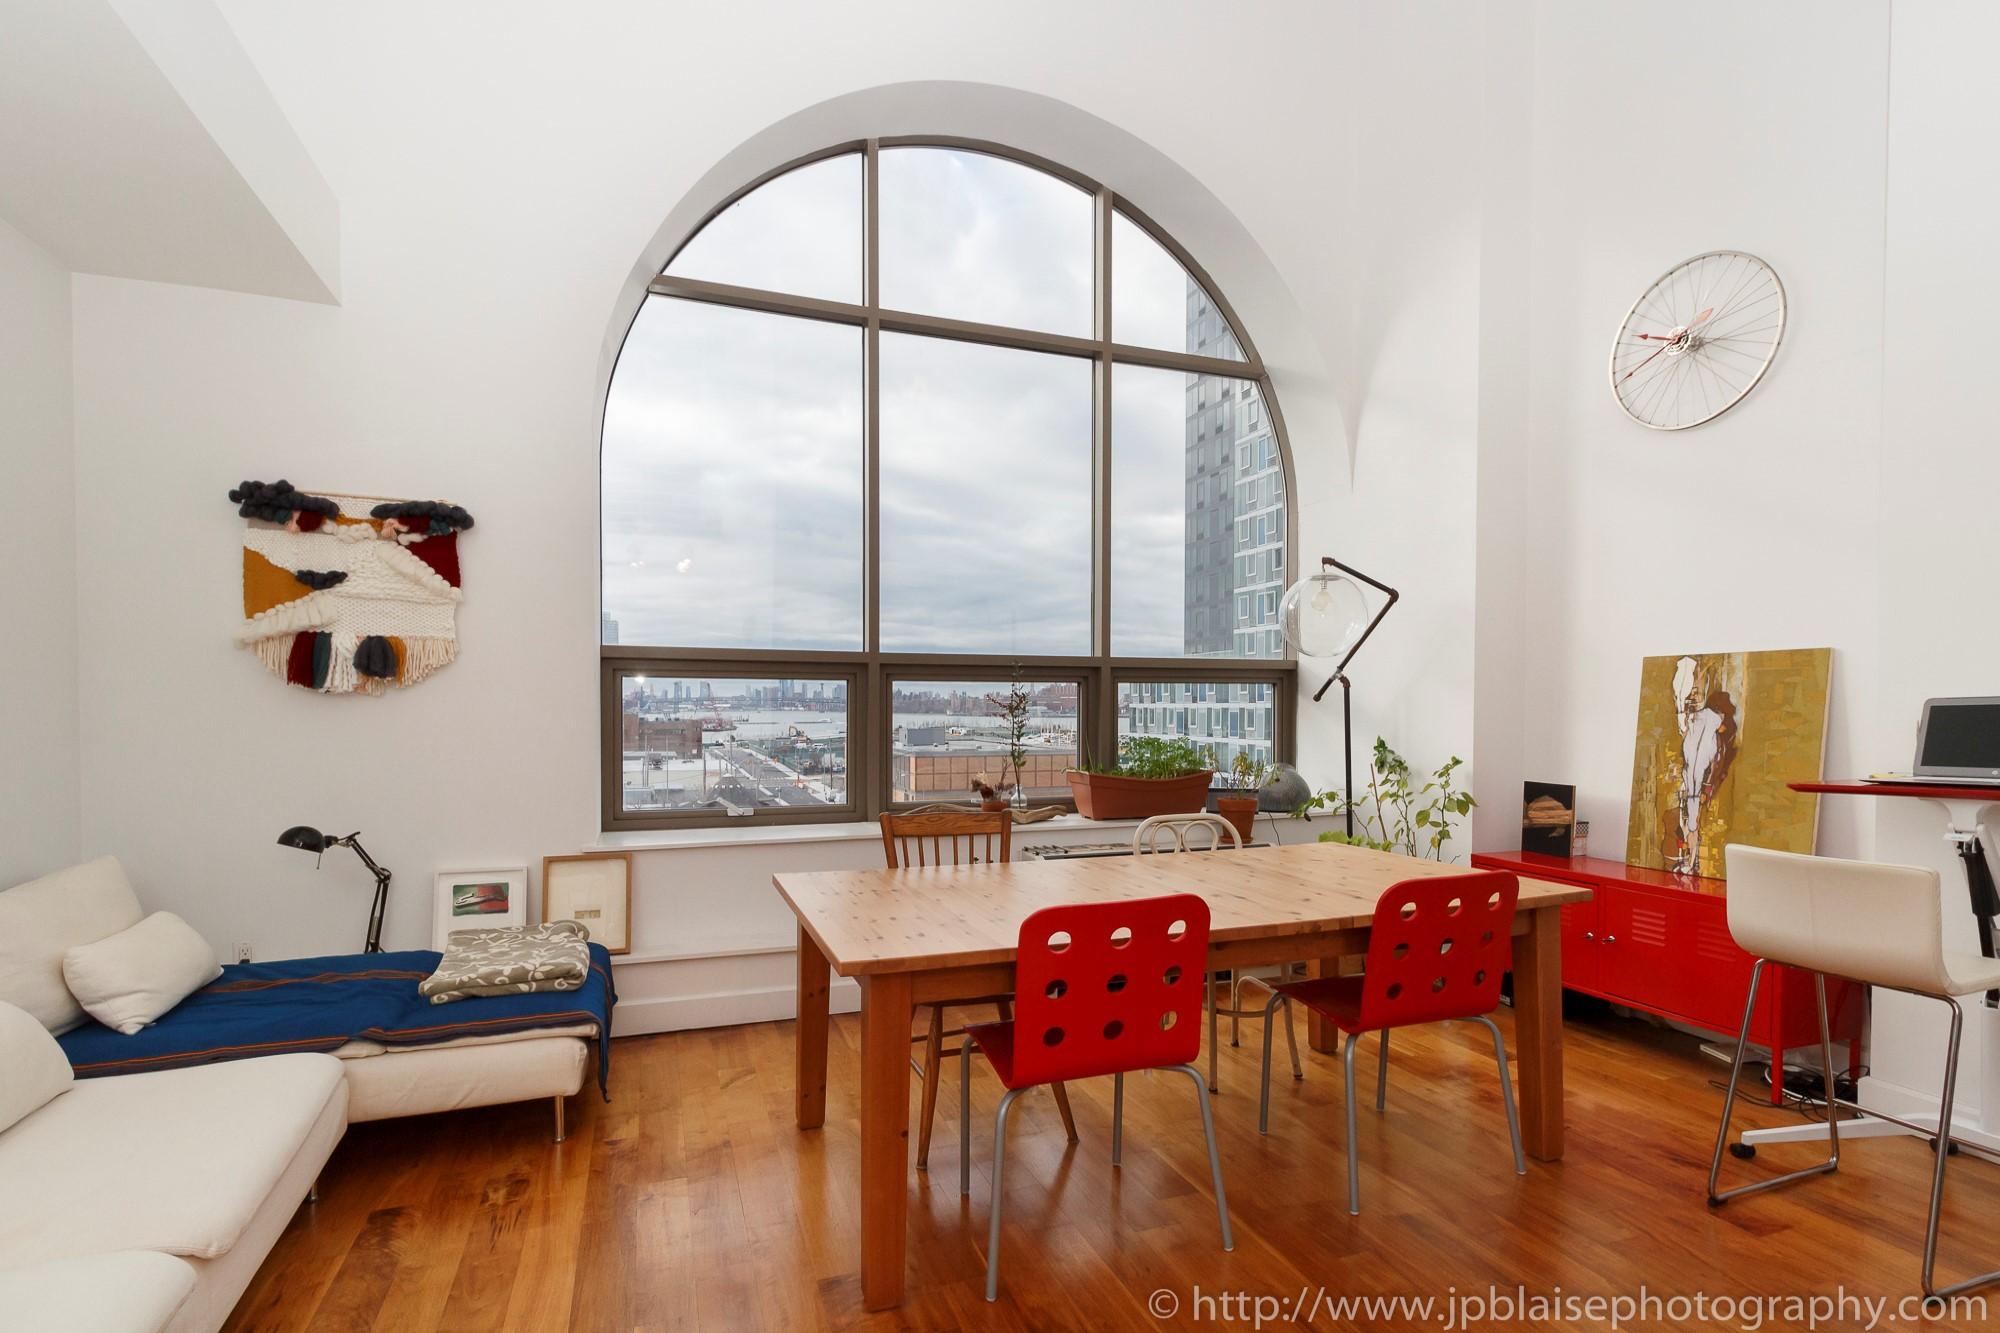 New York City Real Estate Photographer adventures: Lofty ...